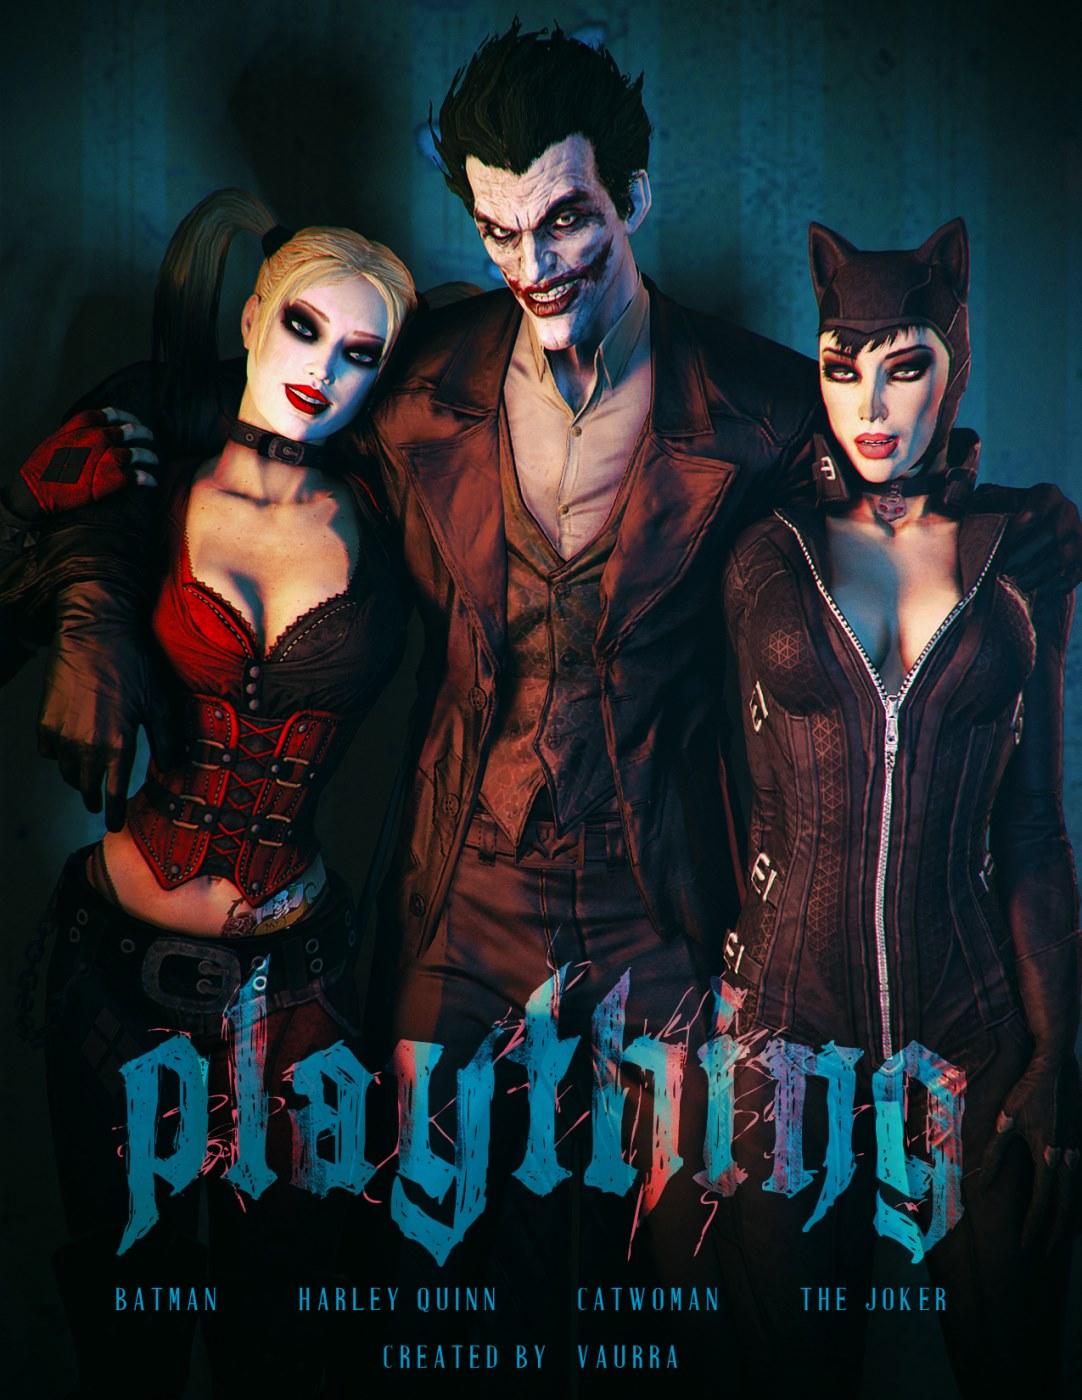 Batman & Harley Quinn- Plaything (Vaurra) image 1